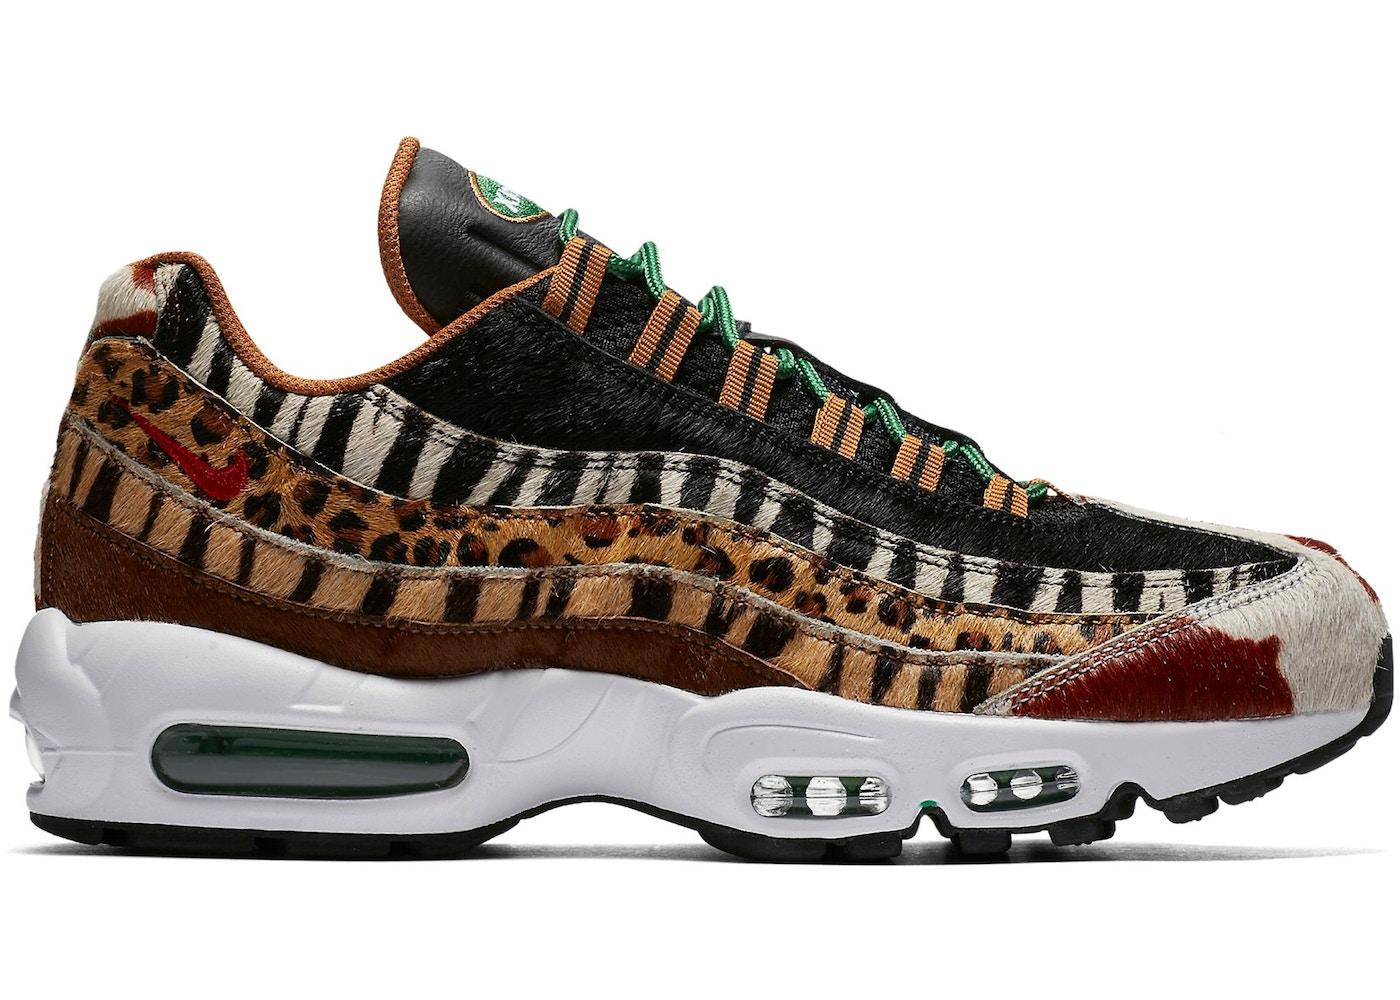 08f41aa416ca68 Nike Air Max 95 Shoes - Highest Bid